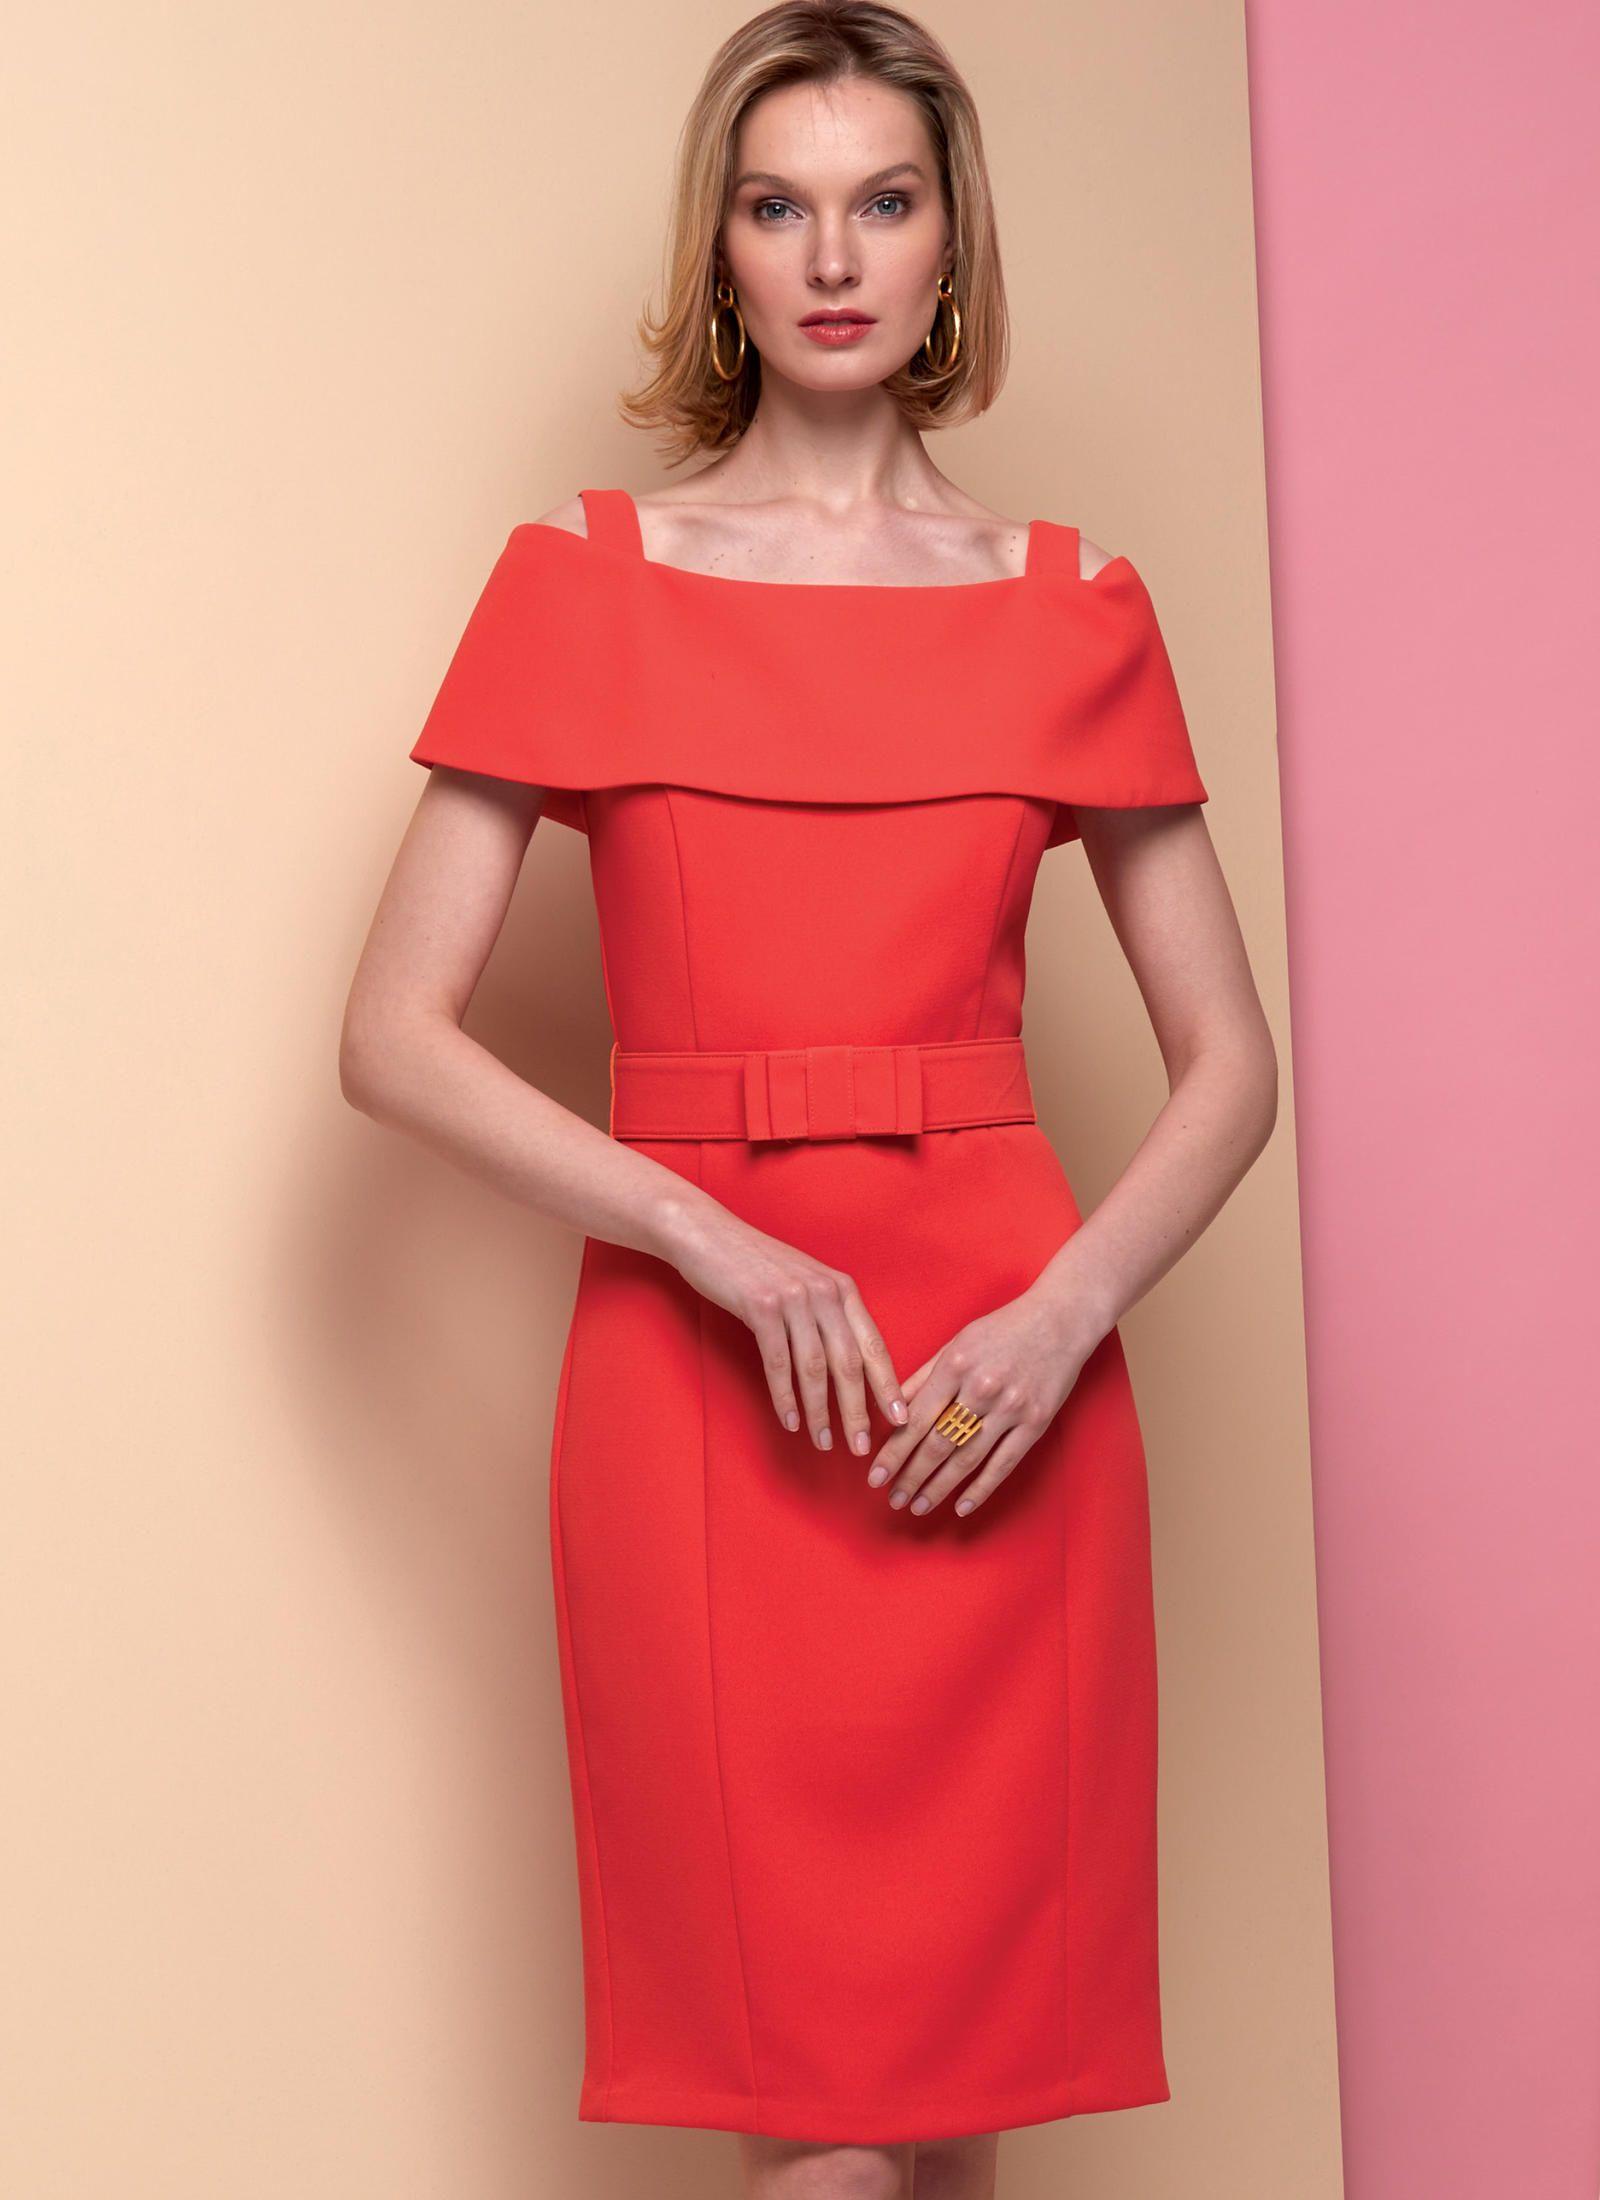 d1543276f V1624 | Misses'/Misses' Petite Dress Sewing Pattern | Vogue Patterns ...